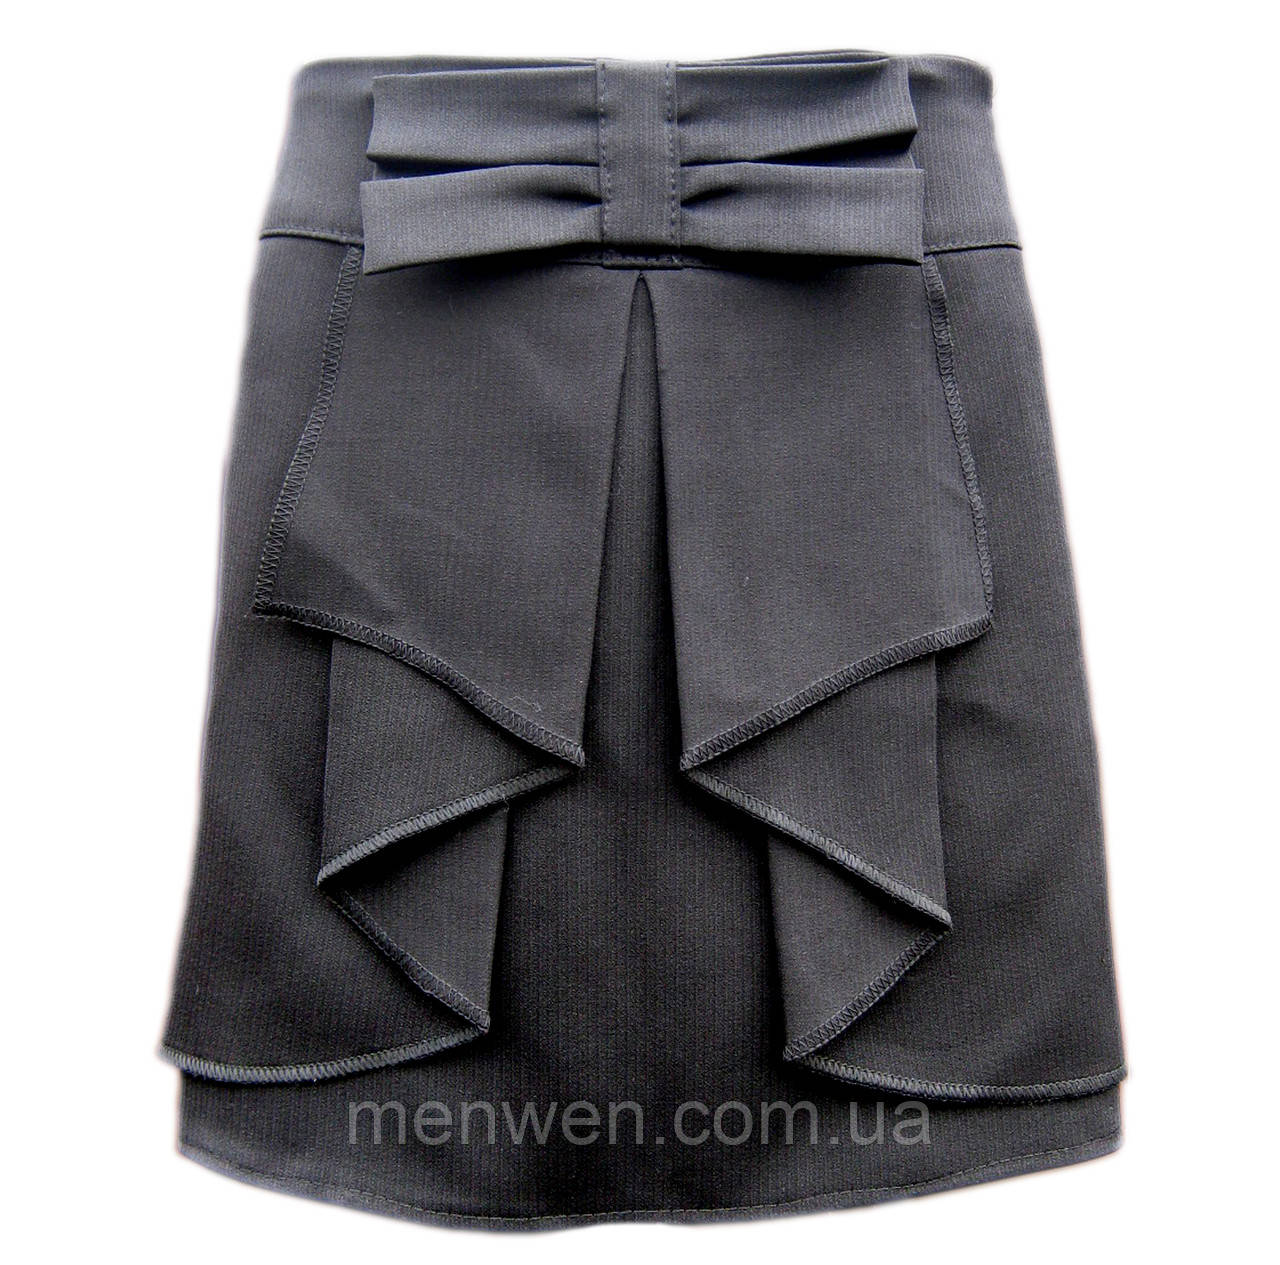 5b7476fc9e6 Школьная юбка для девочки 6-10 лет  продажа